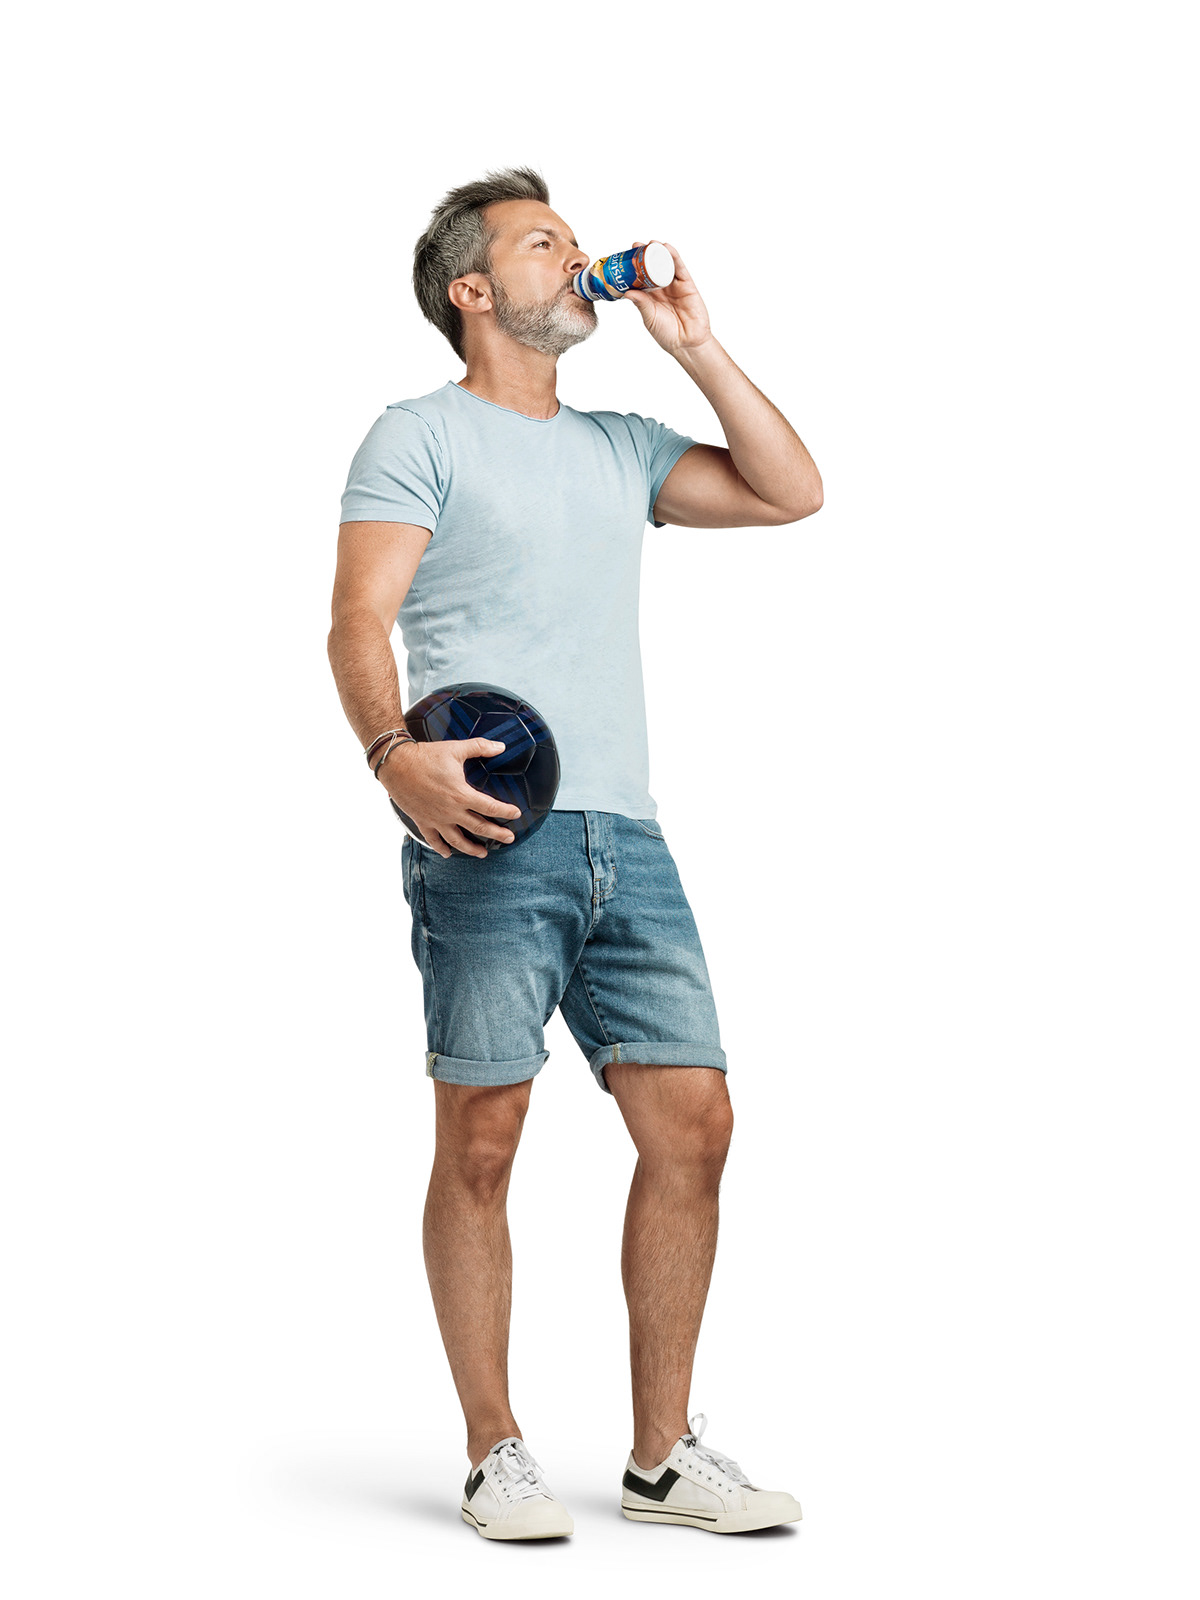 Image may contain: person, man and shorts